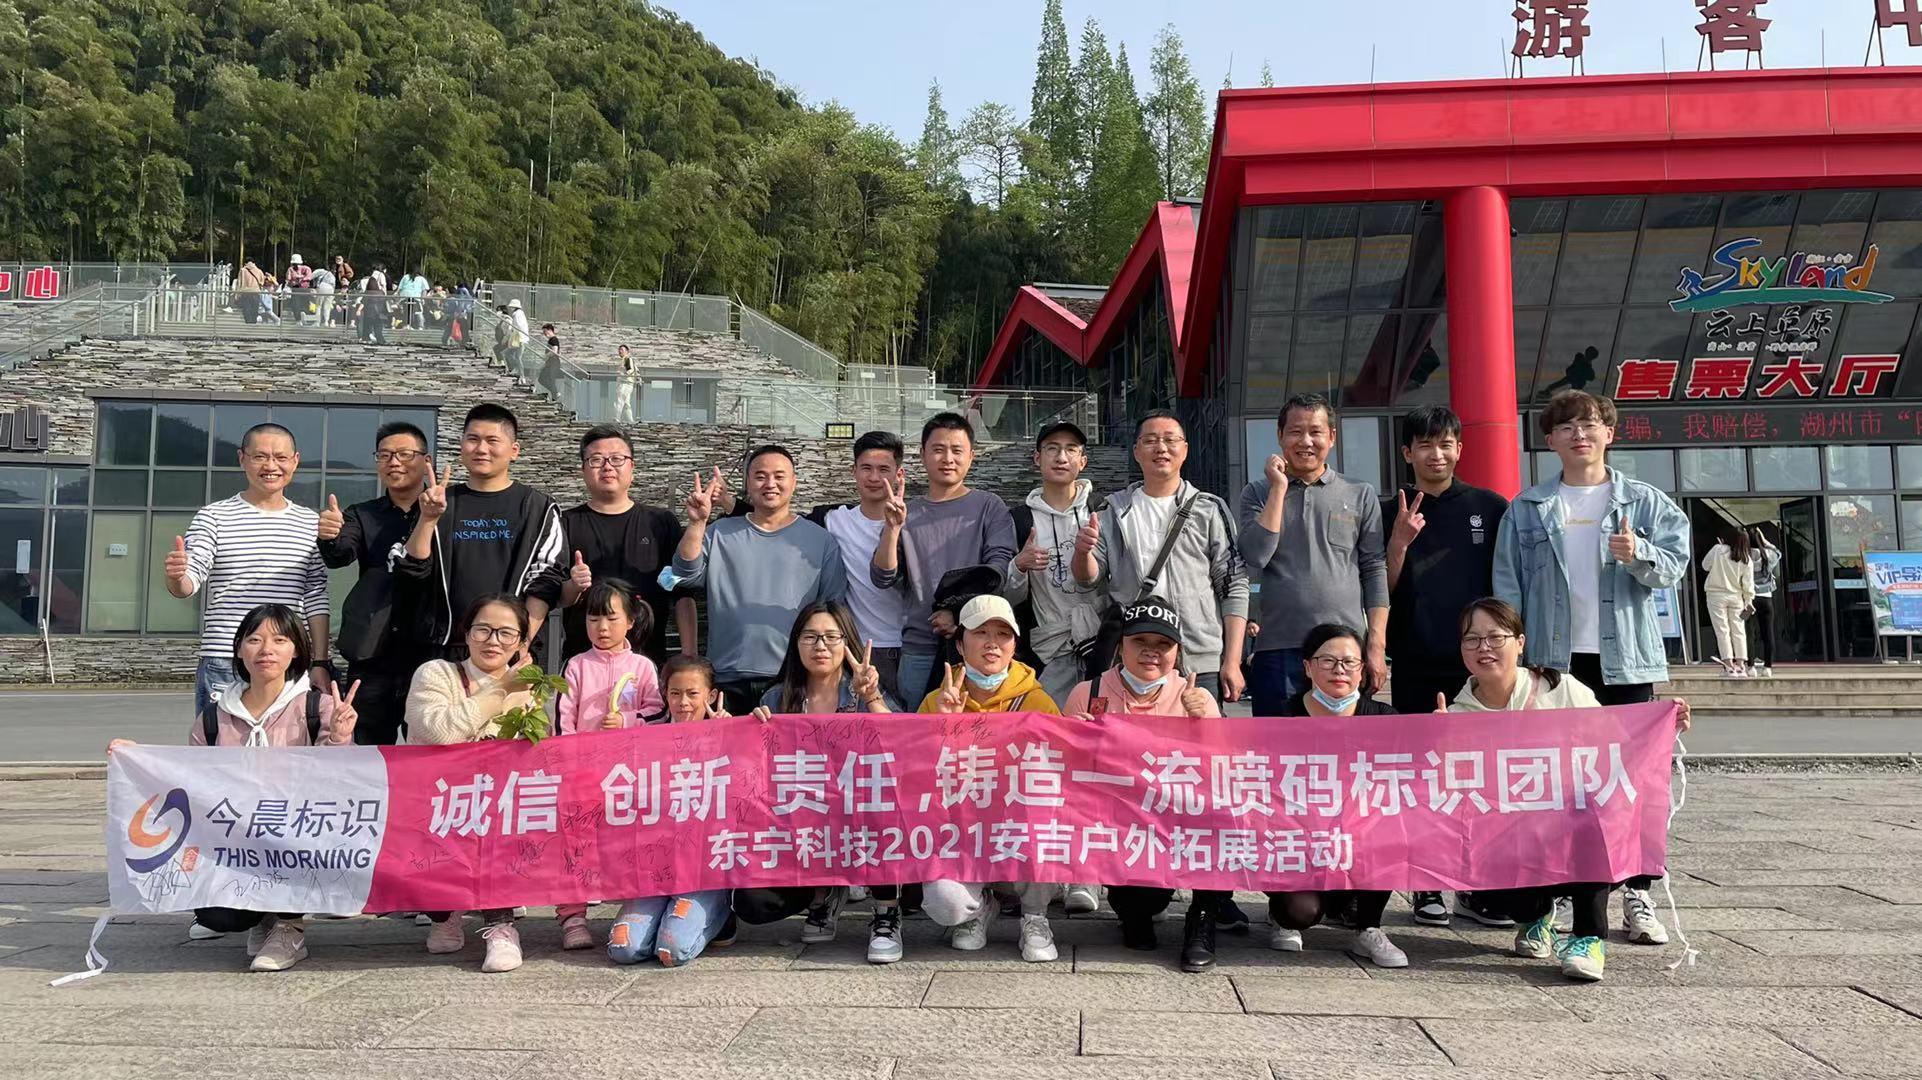 2021 Hangzhou Dongning Technology Co., Ltd Entraînement en plein air à Anji